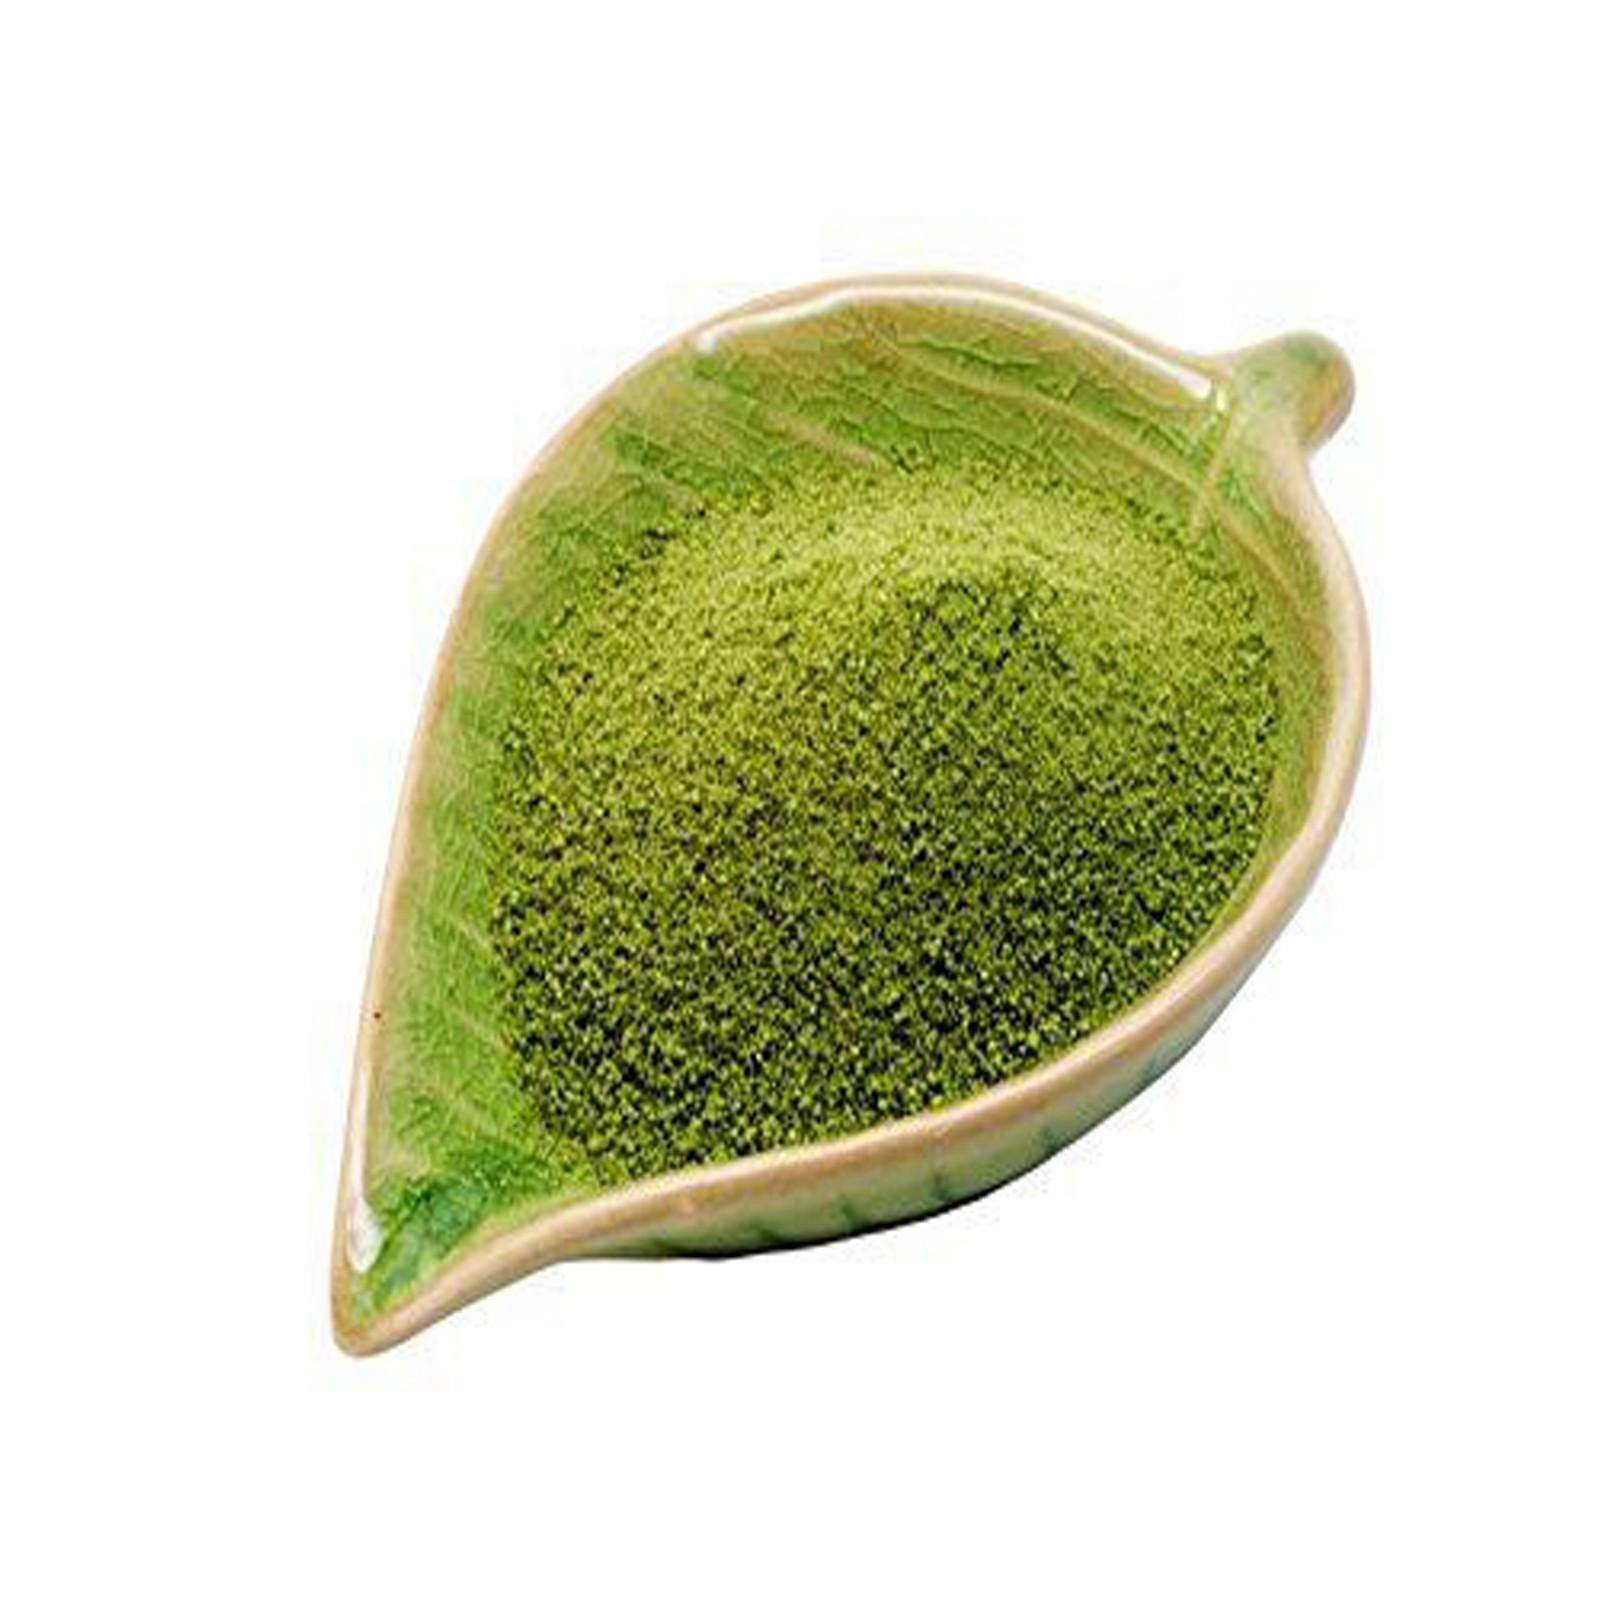 Kelp Seaweed Powder for Slimming & Detox